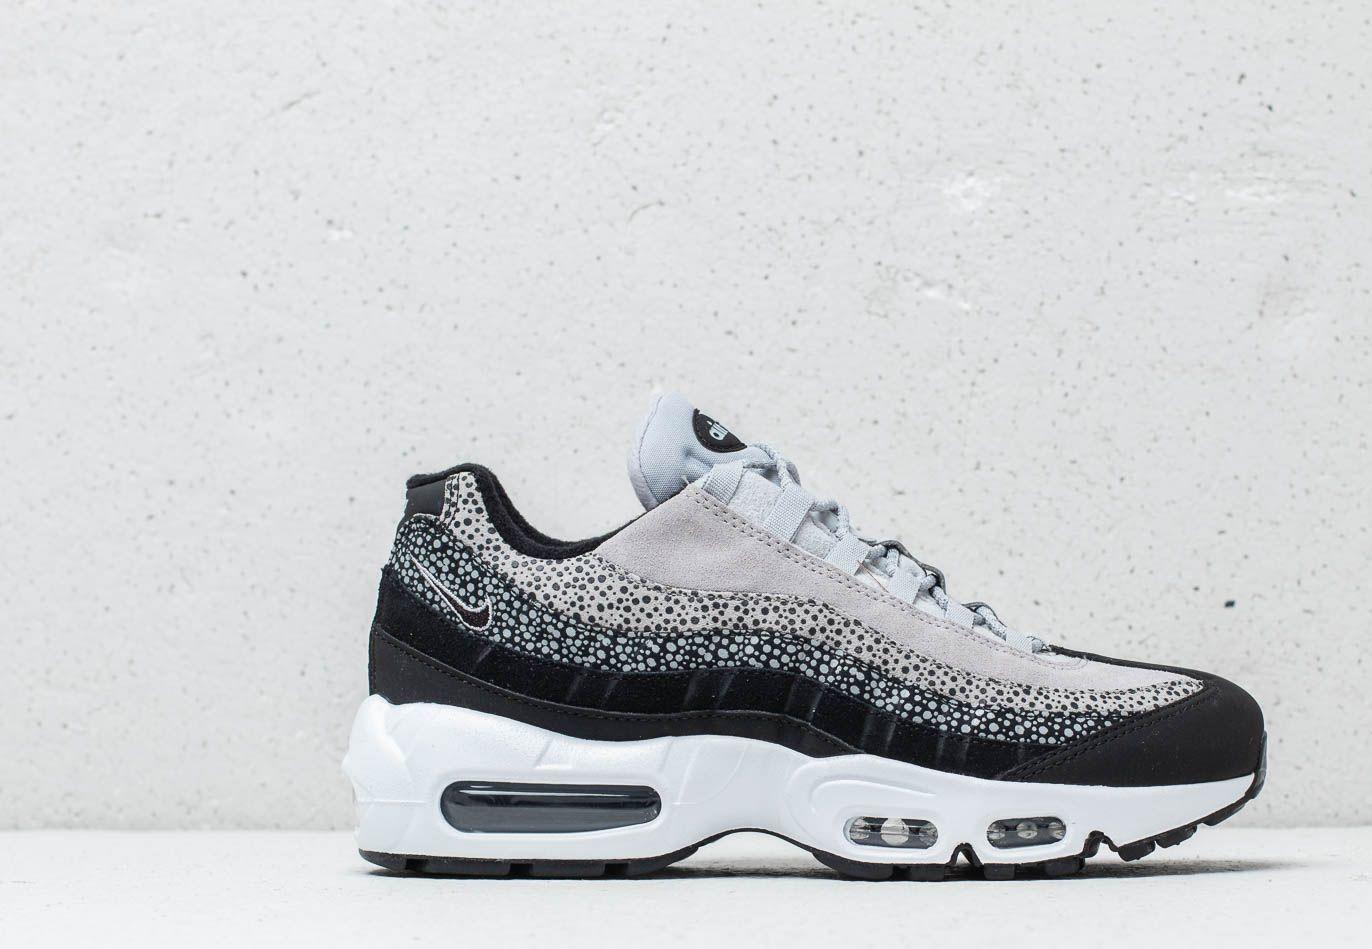 0391b0b5f1 Nike Wmns Air Max 95 Premium Black/ Black-wolf Grey-white in Black ...